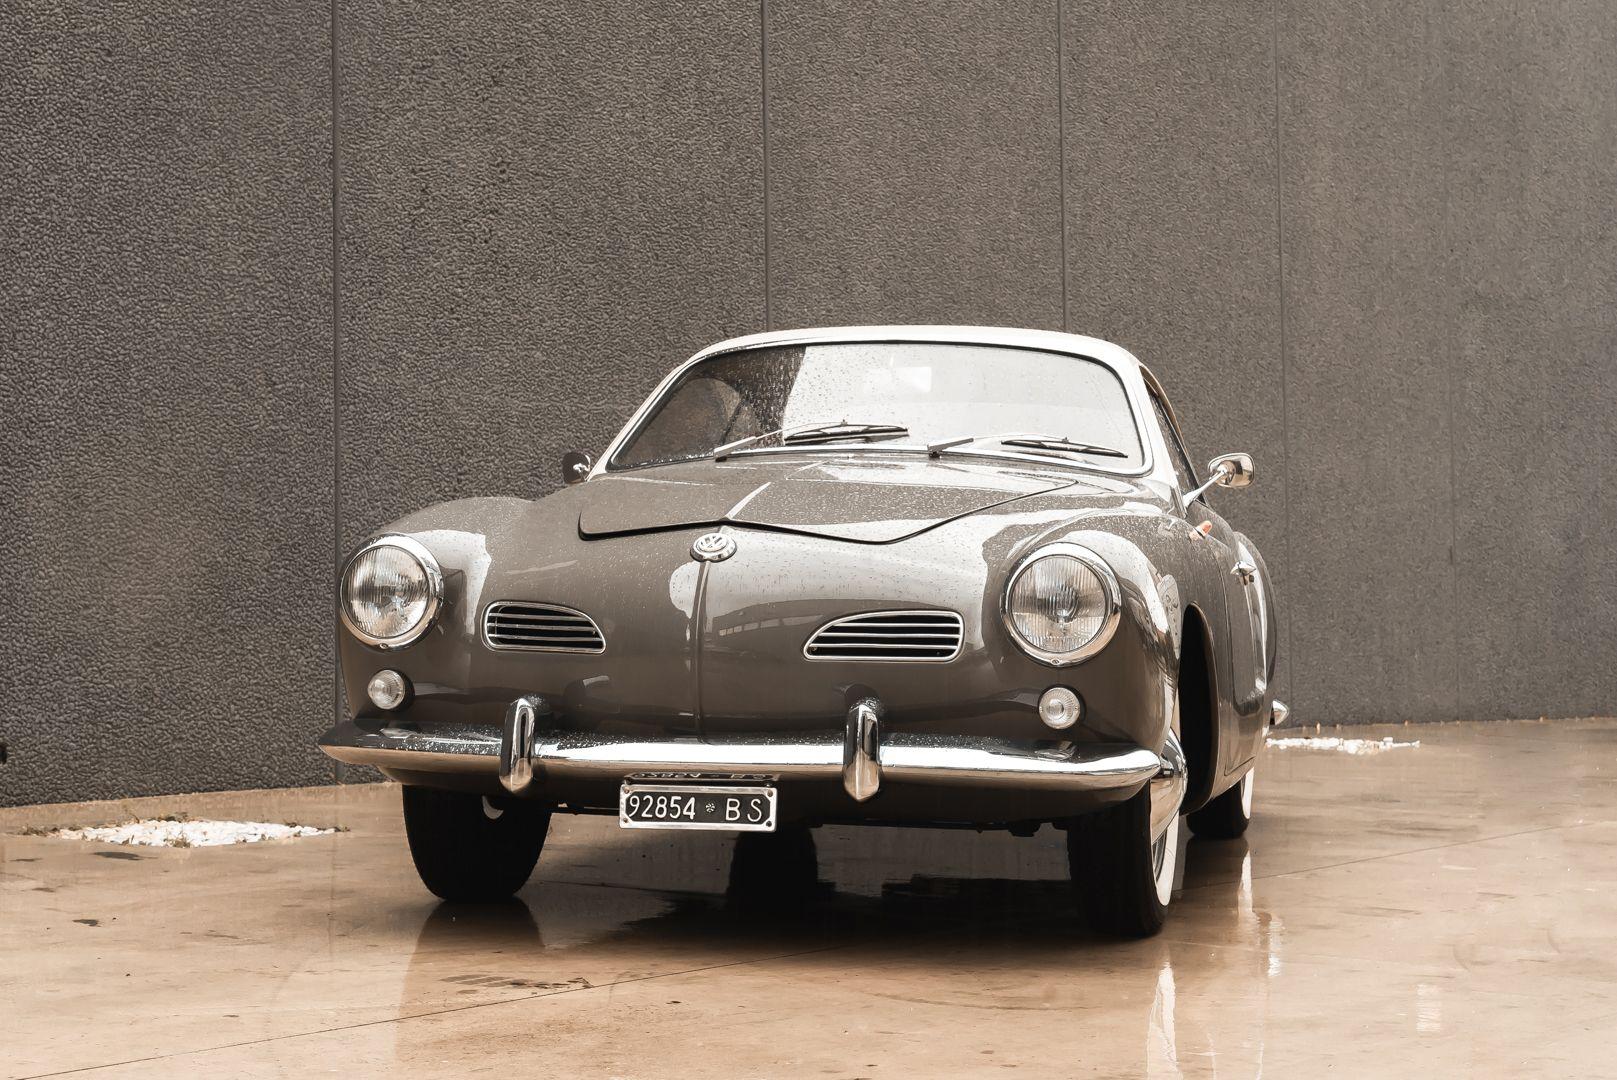 1961 Volkswagen Karmann Ghia 81142